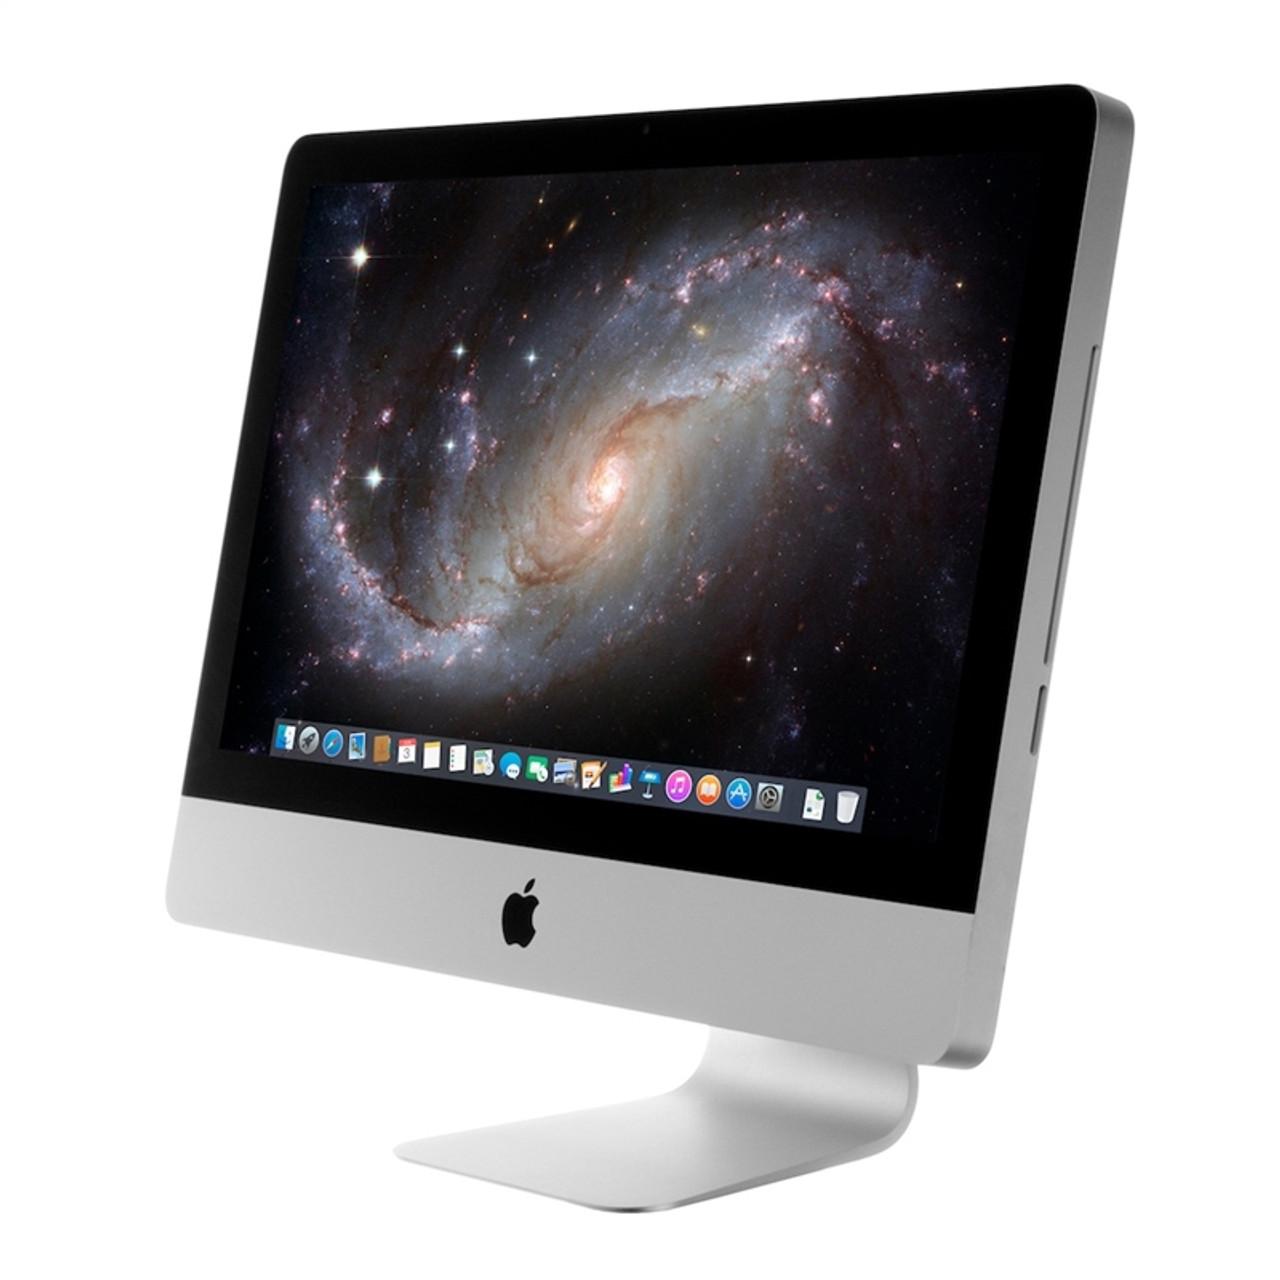 apple imac 21 5 inch 3 33ghz core 2 duo late 2009 mc413ll a 1